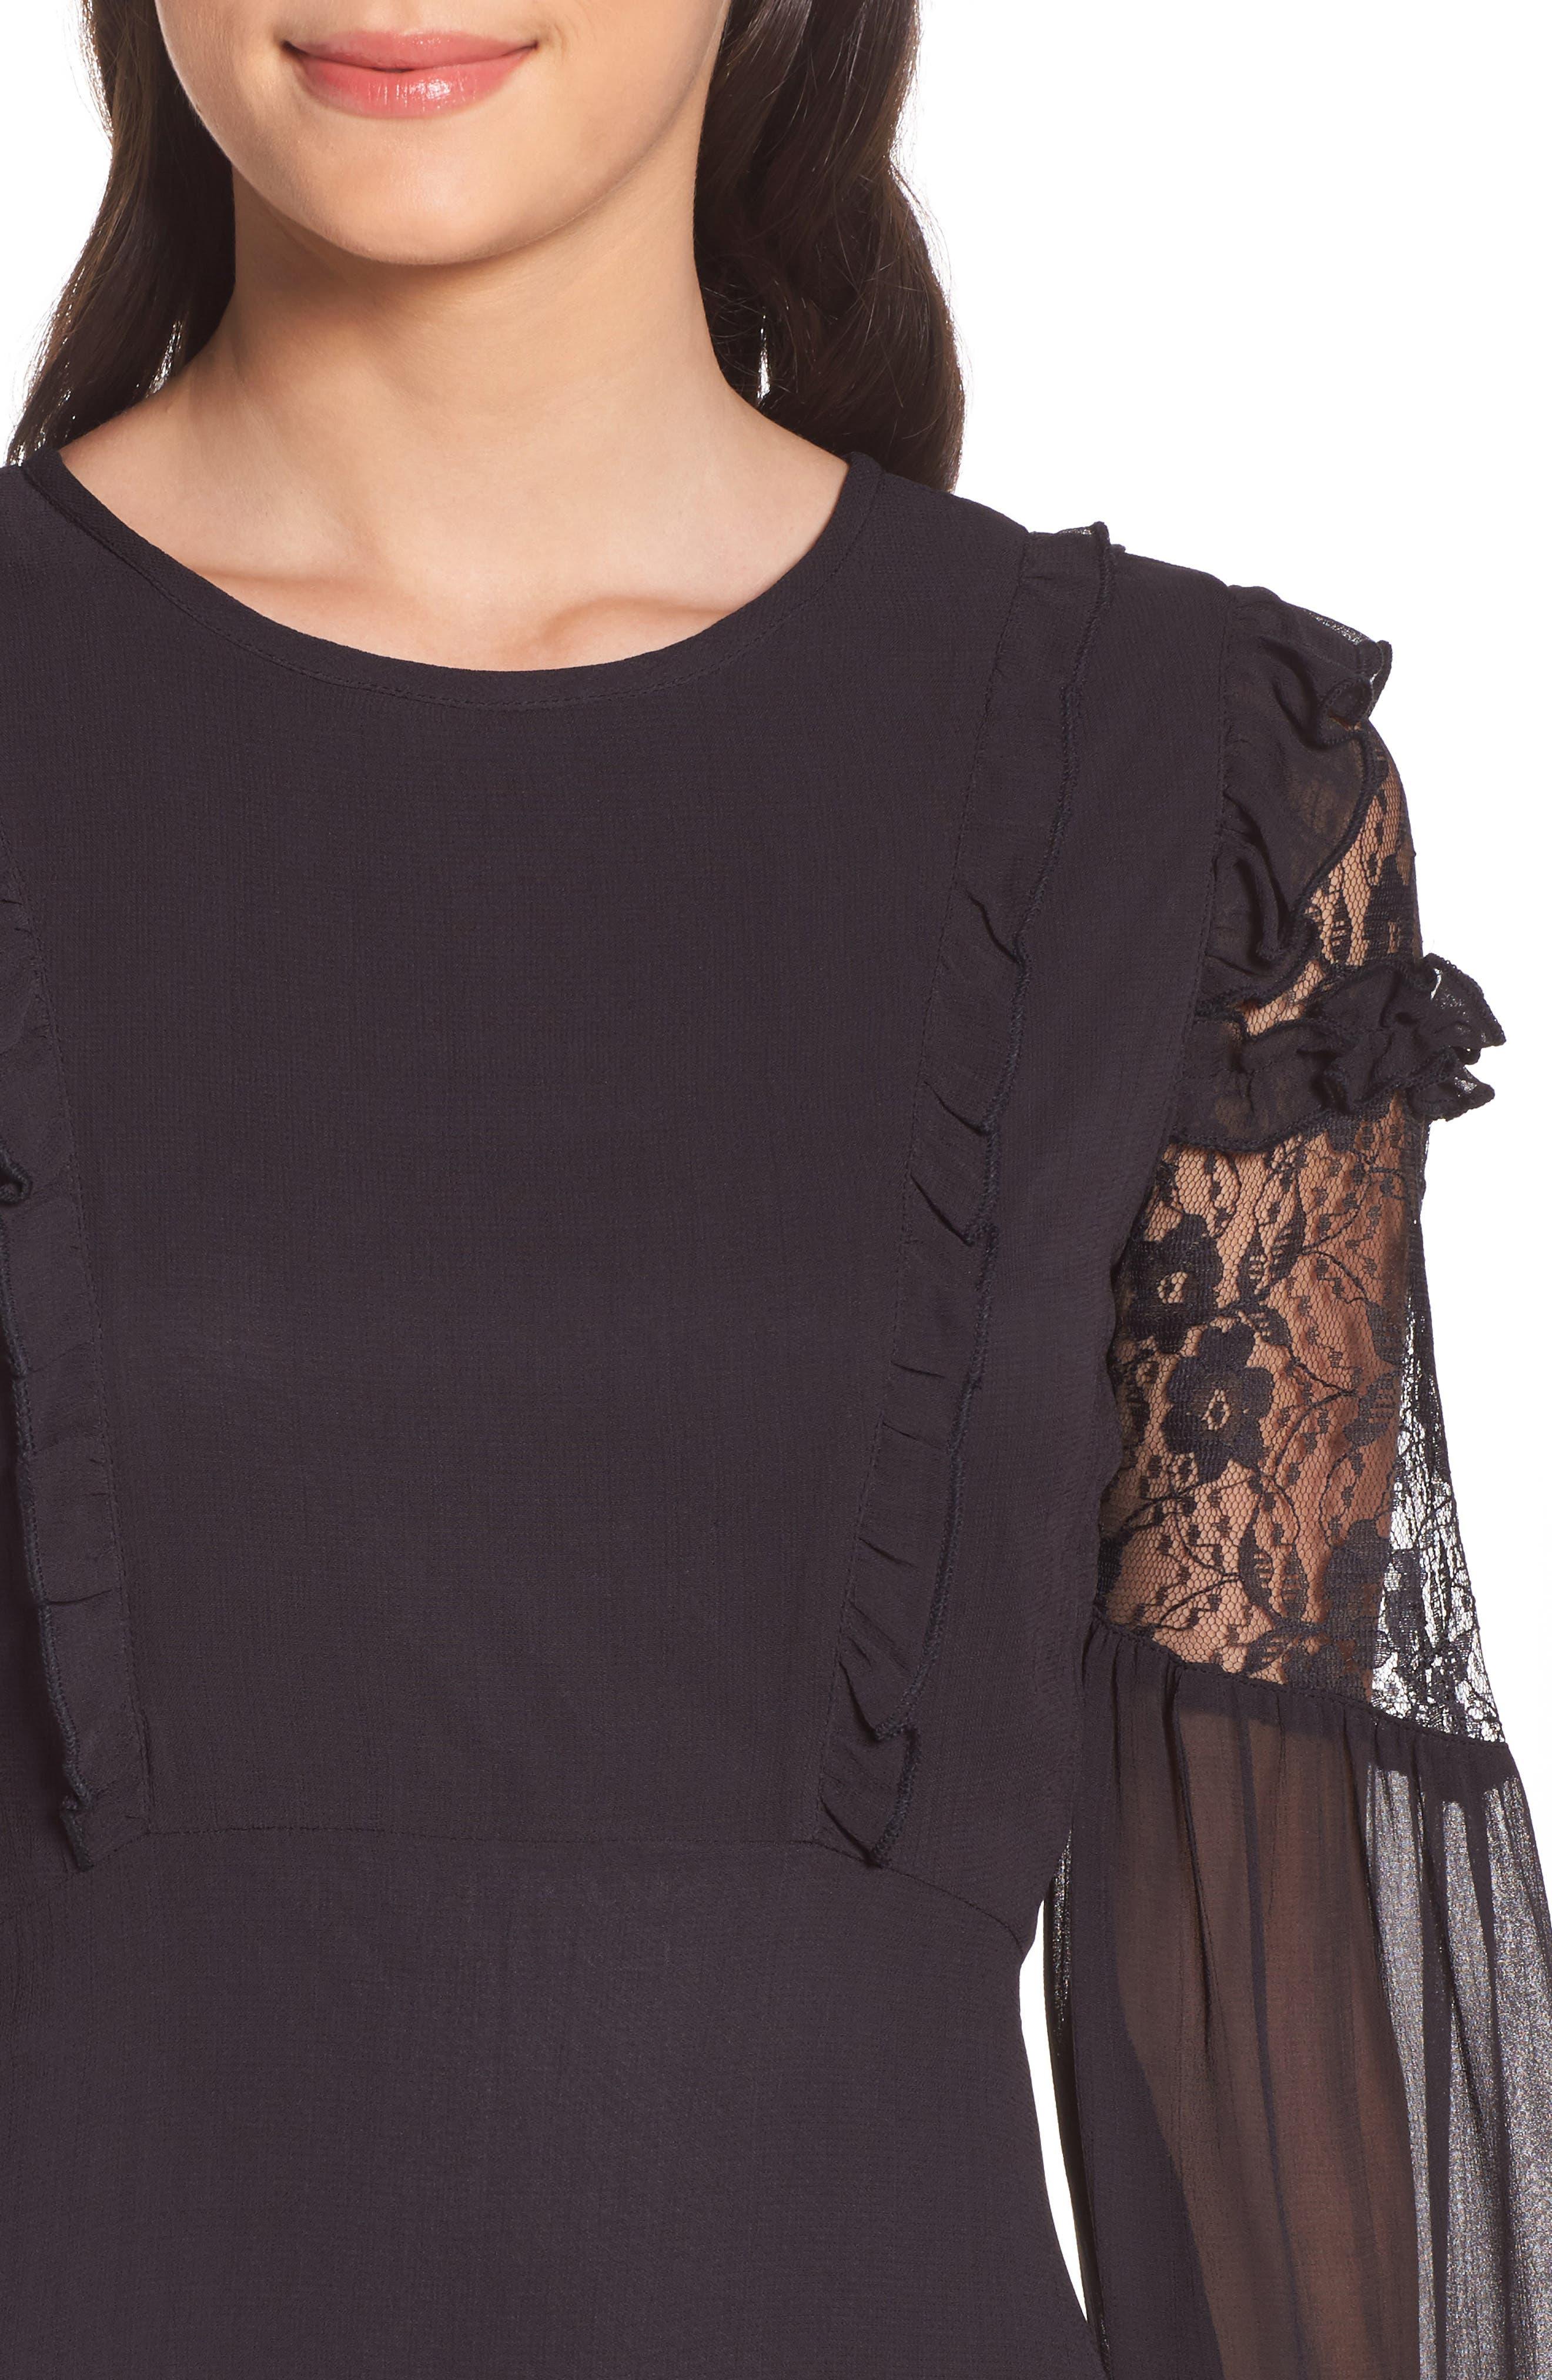 Lace & Chiffon Dress,                             Alternate thumbnail 4, color,                             001